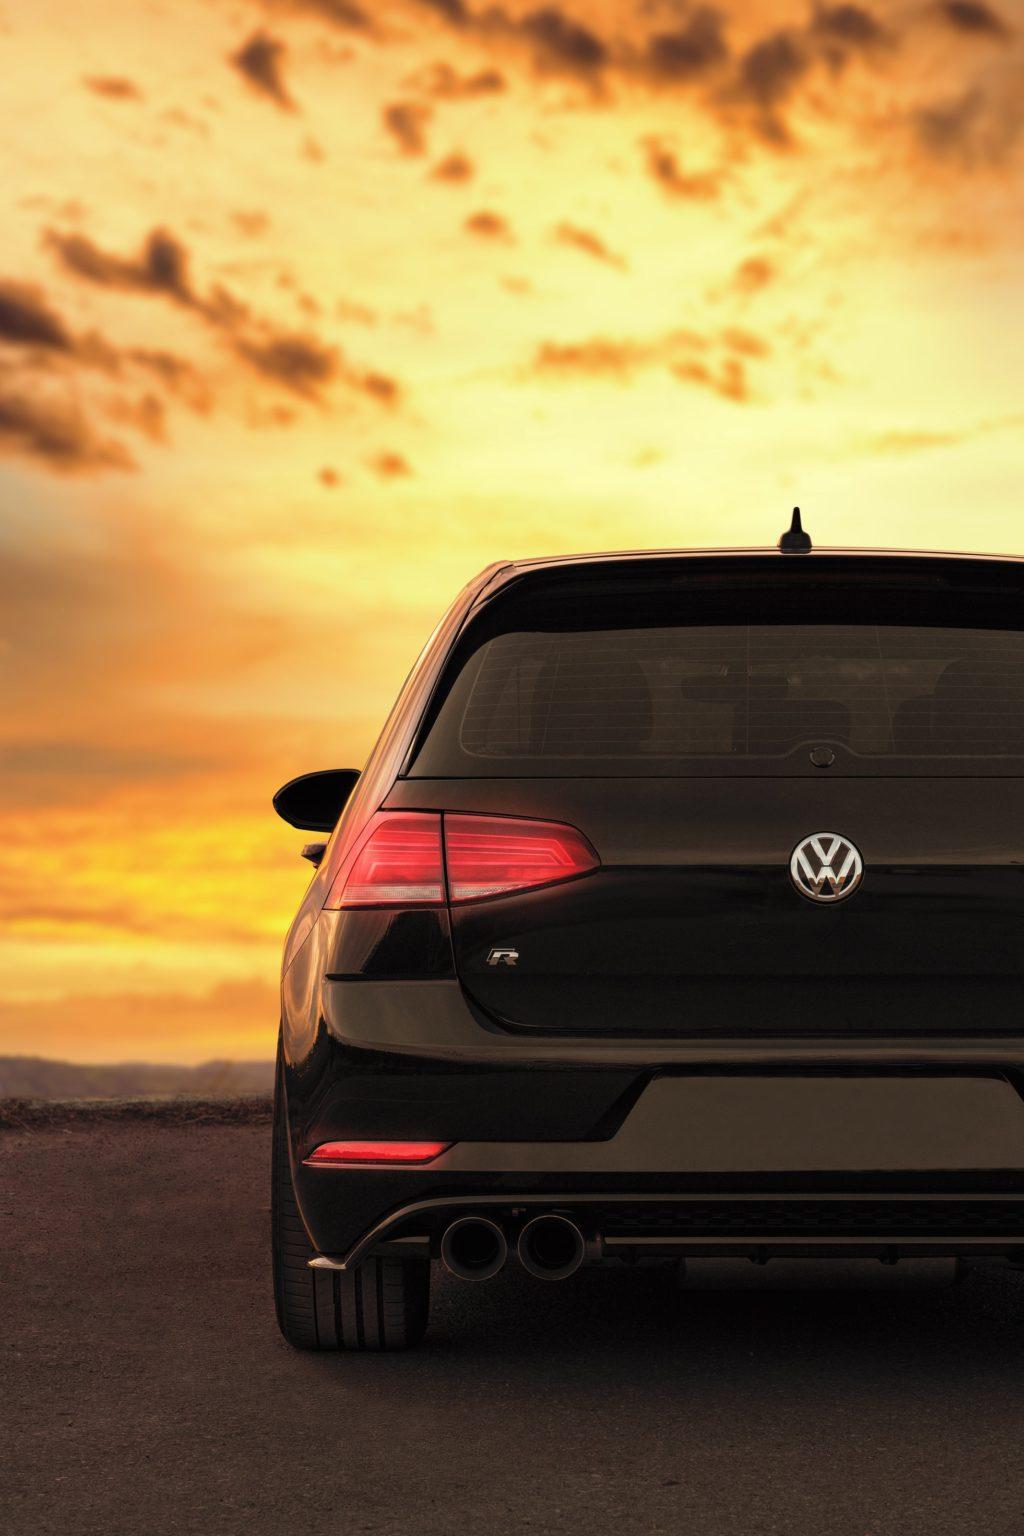 automotive photography golden hour lighting